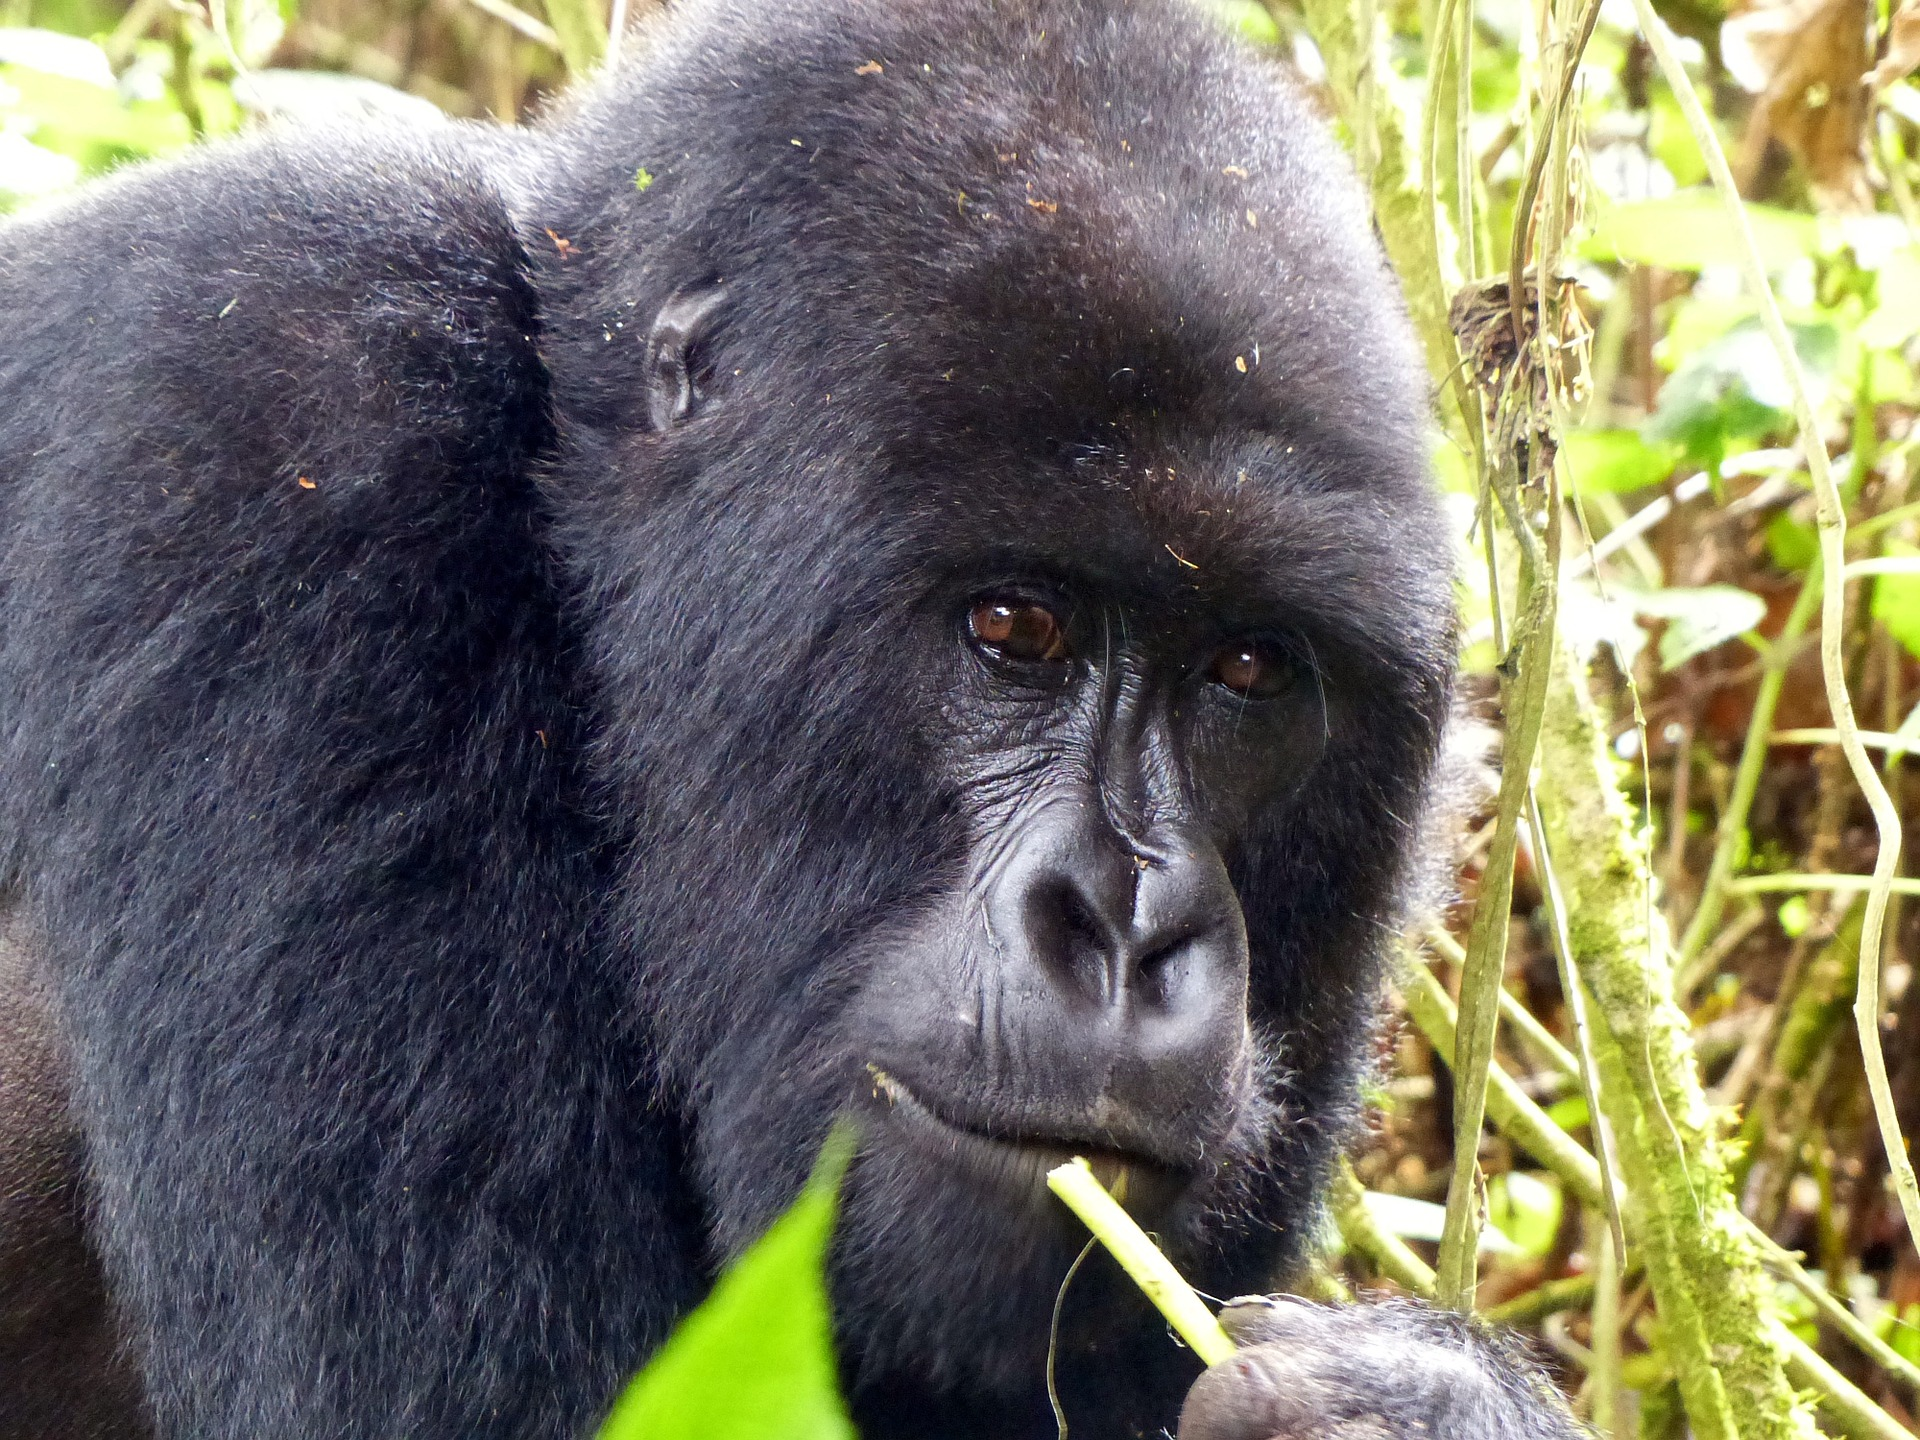 gorilla-818003_1920.jpg